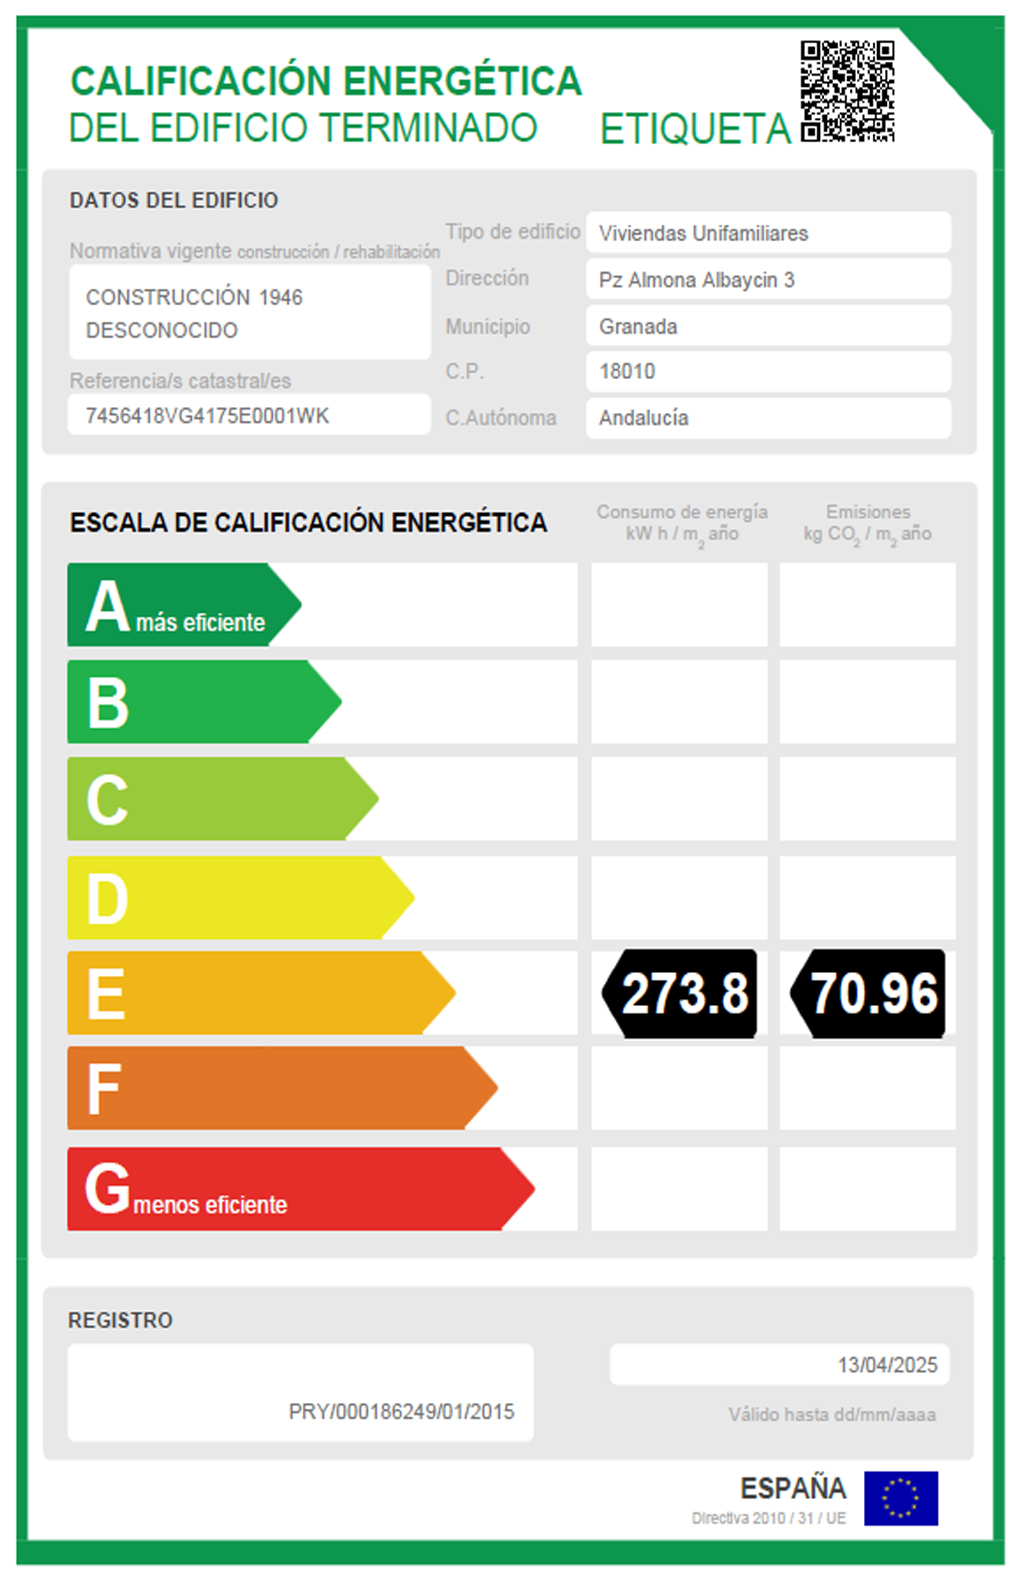 Etiqueta de Calificacion Energetica